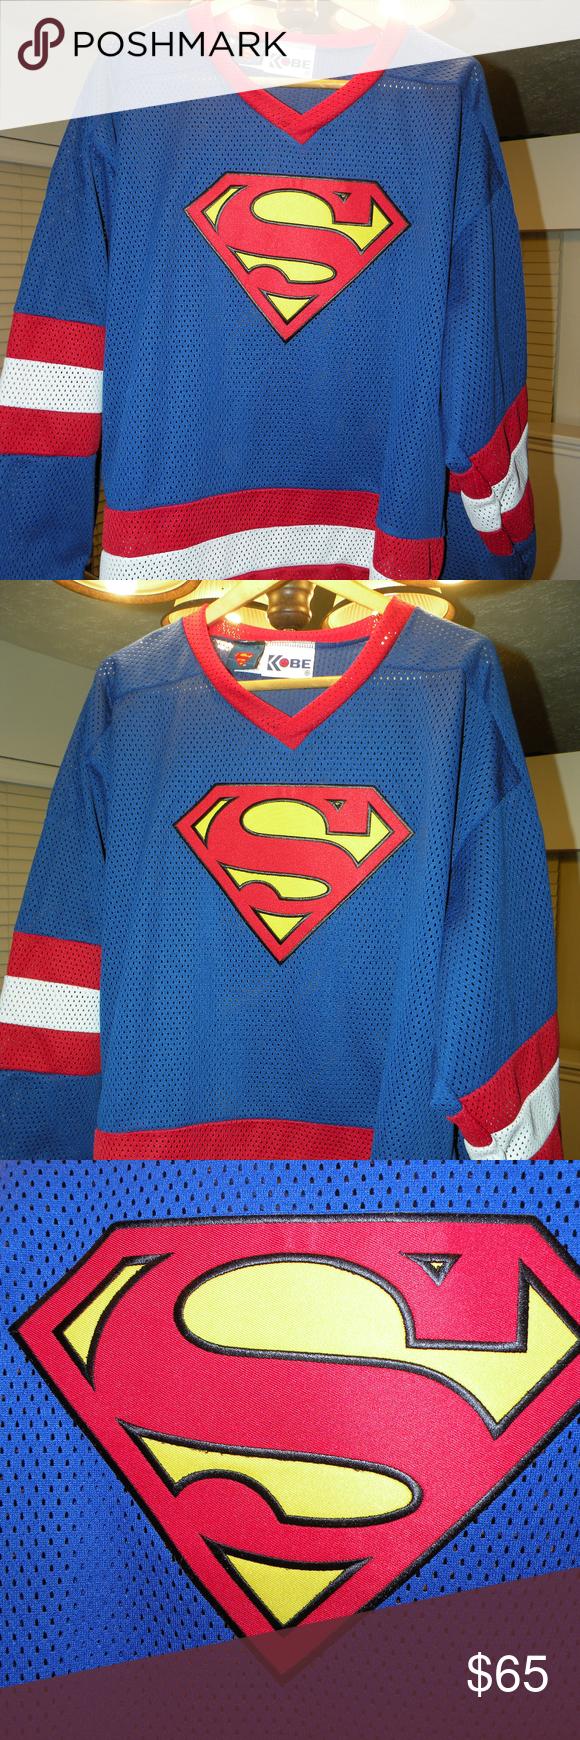 SuperMan Hockey Jersey Size xl Like new made by Kobe in canada Kobe Shirts  Tees - Long Sleeve 94eb10d71ed